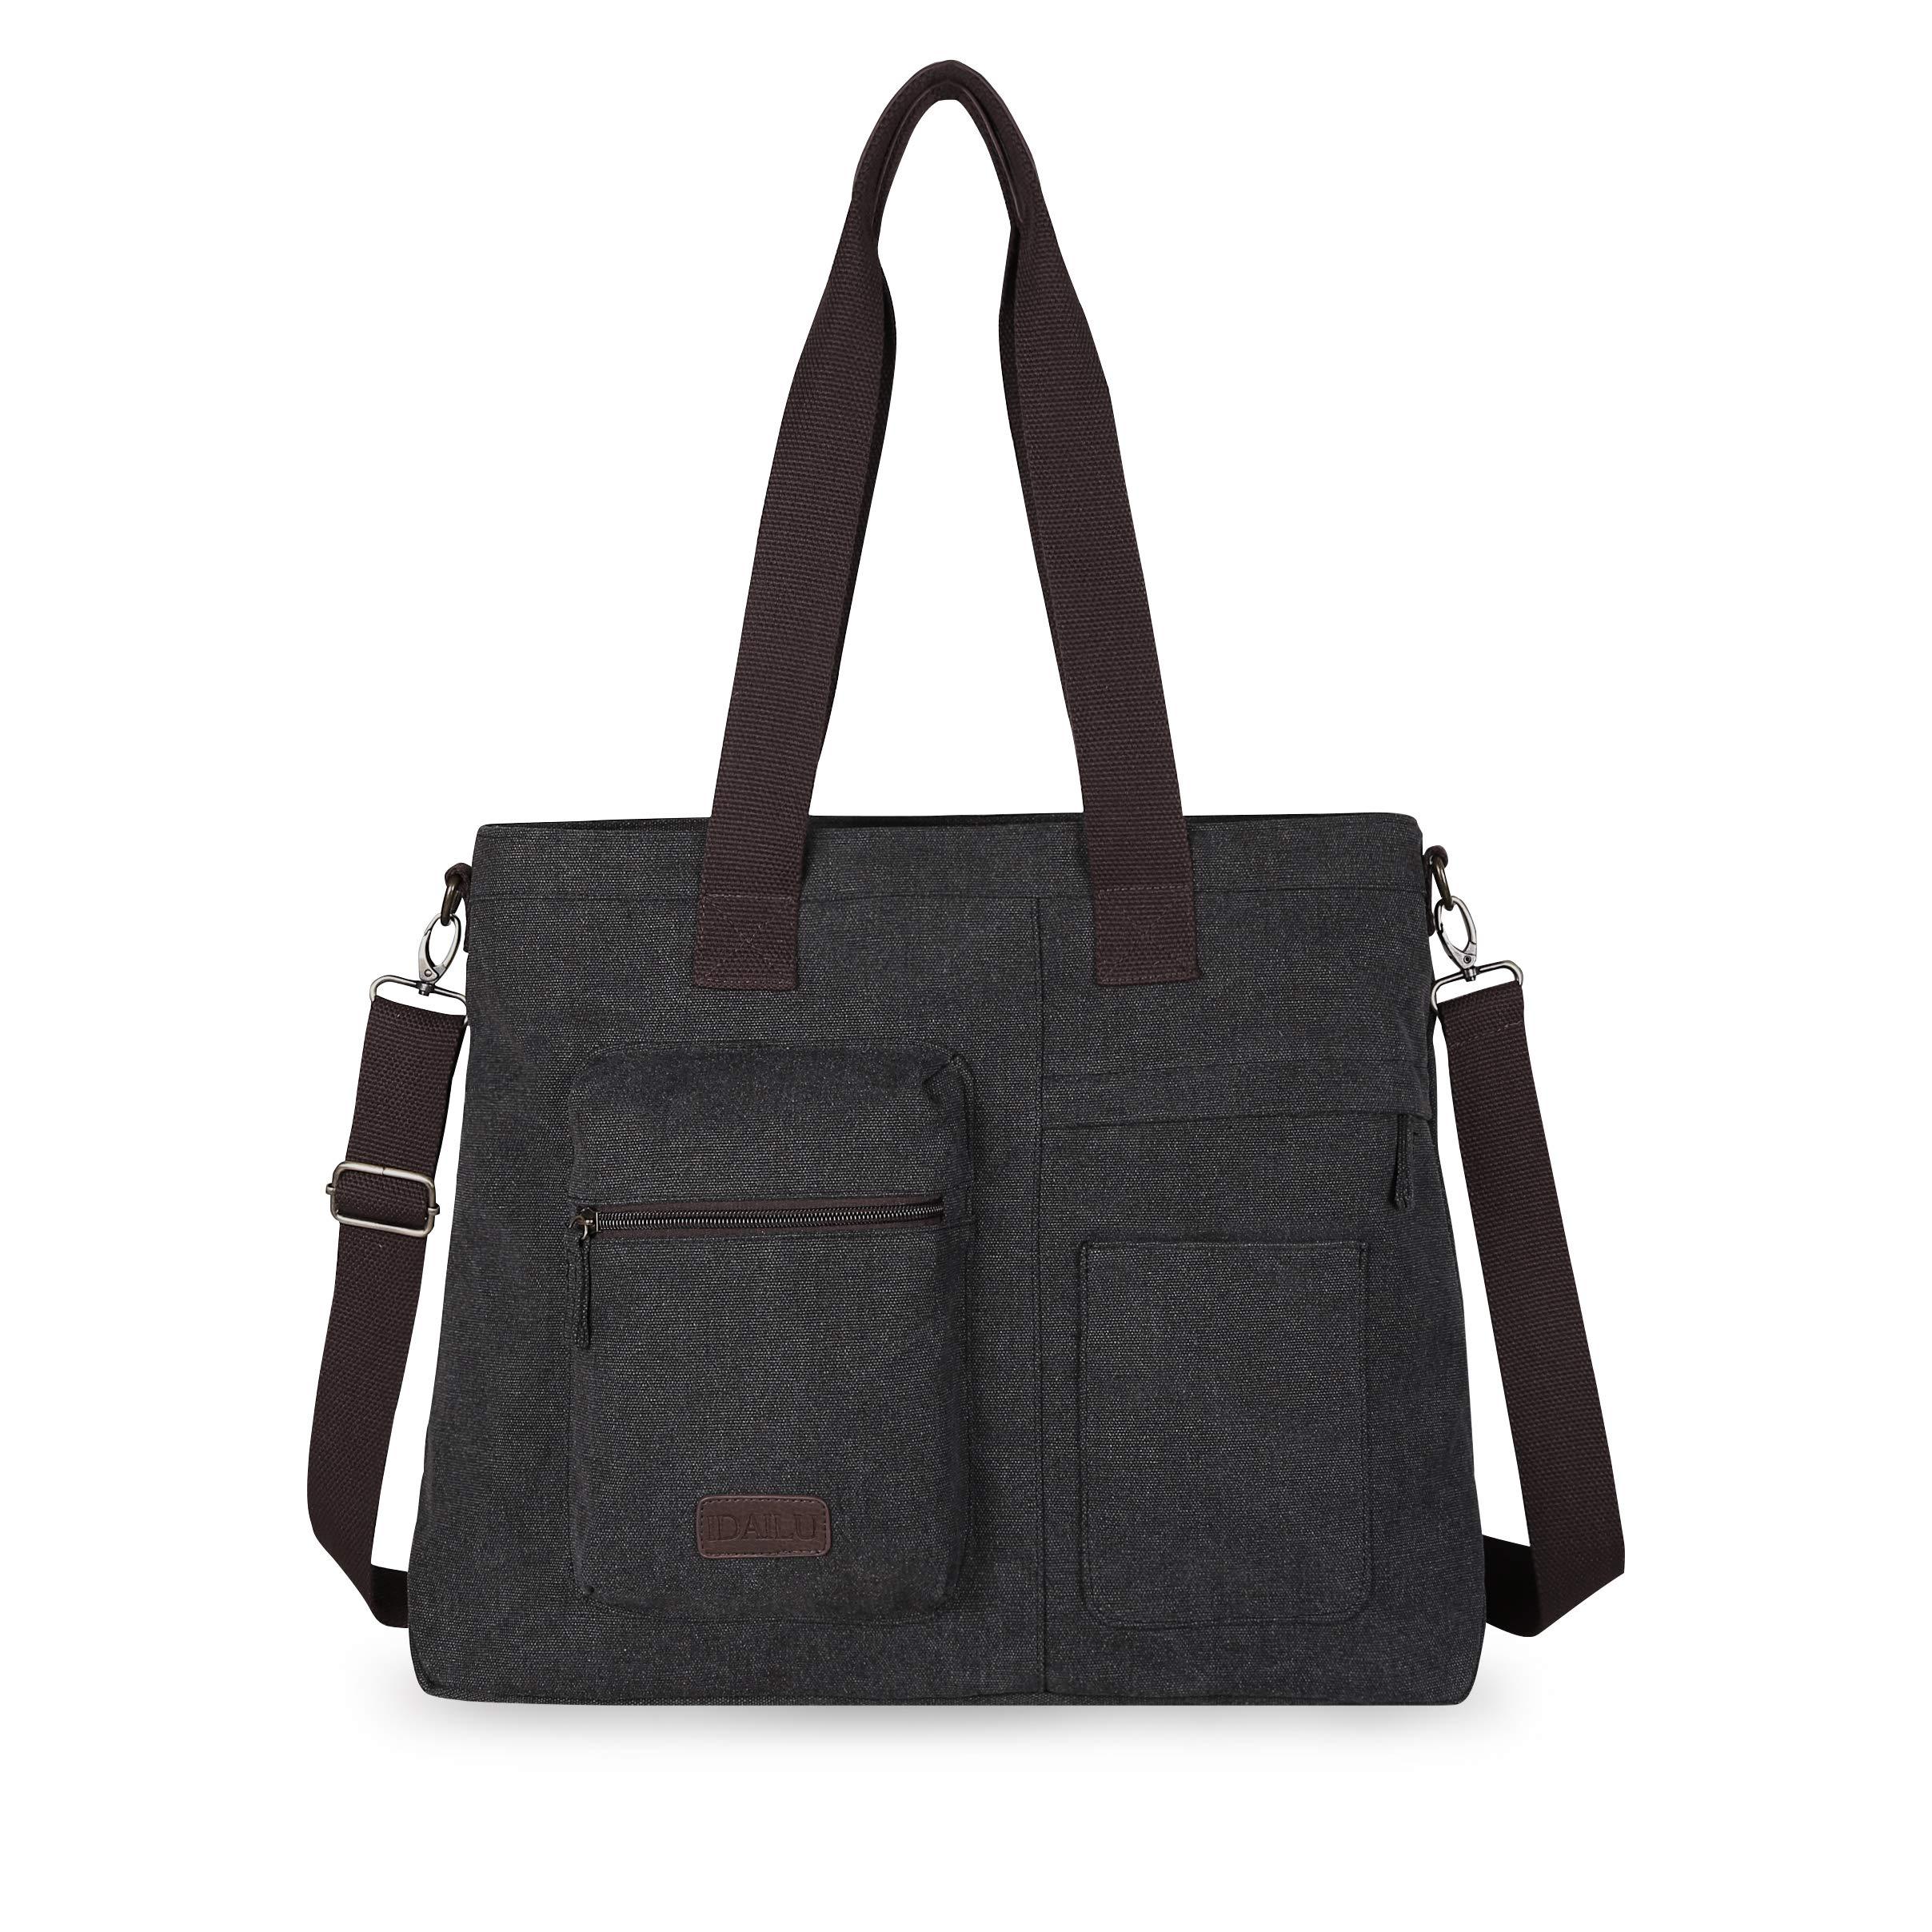 IDAILU Large Canvas Tote Bag Casual Daily Cross-body Hobo Handbags with Detachable Shoulder Strap (Black) by IDAILU